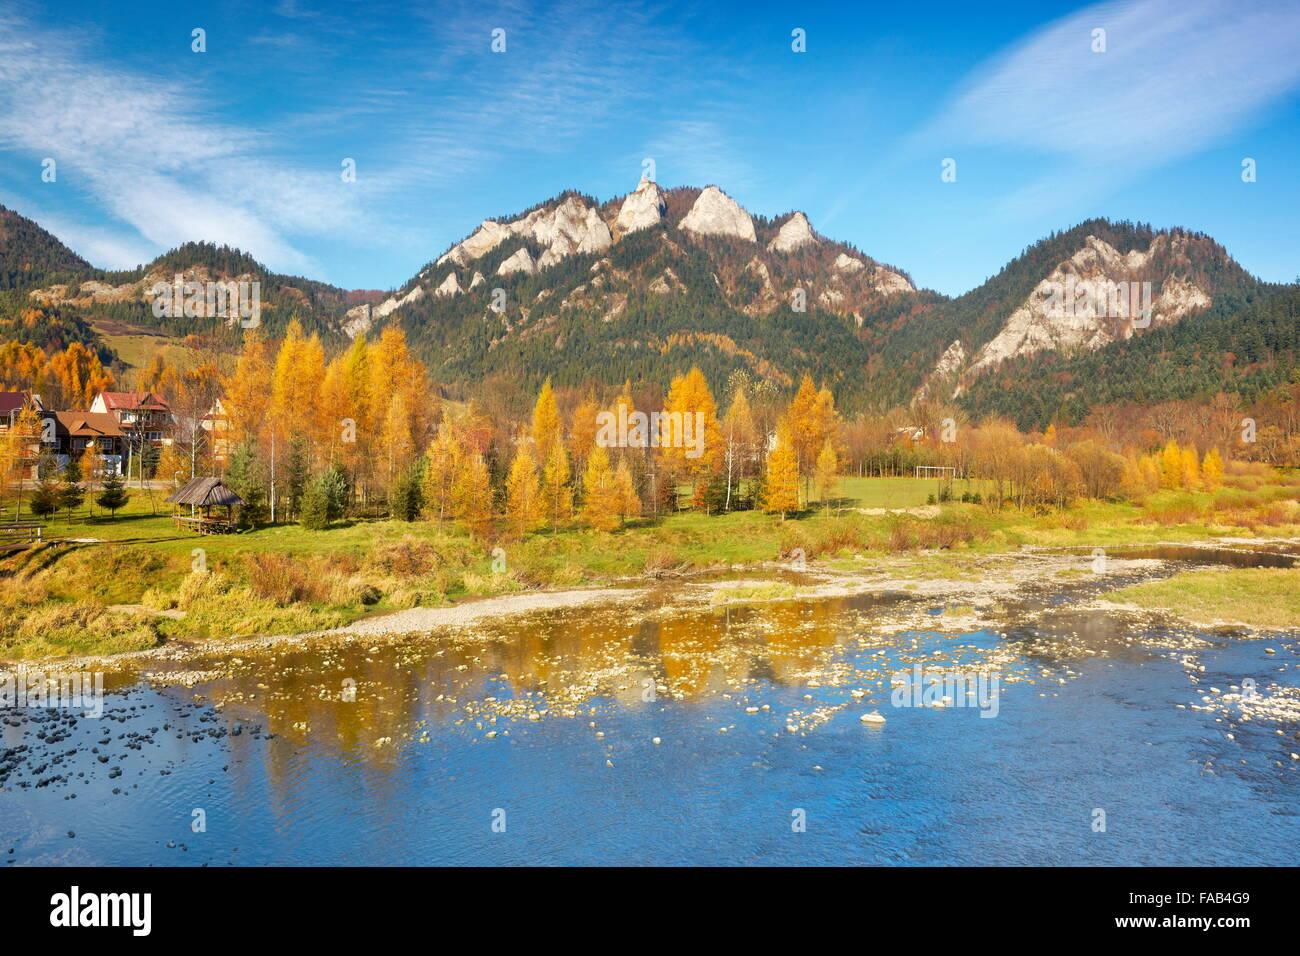 Pieniny Mountains - Dunajec River and Trzy Korony Peak, Poland - Stock Image